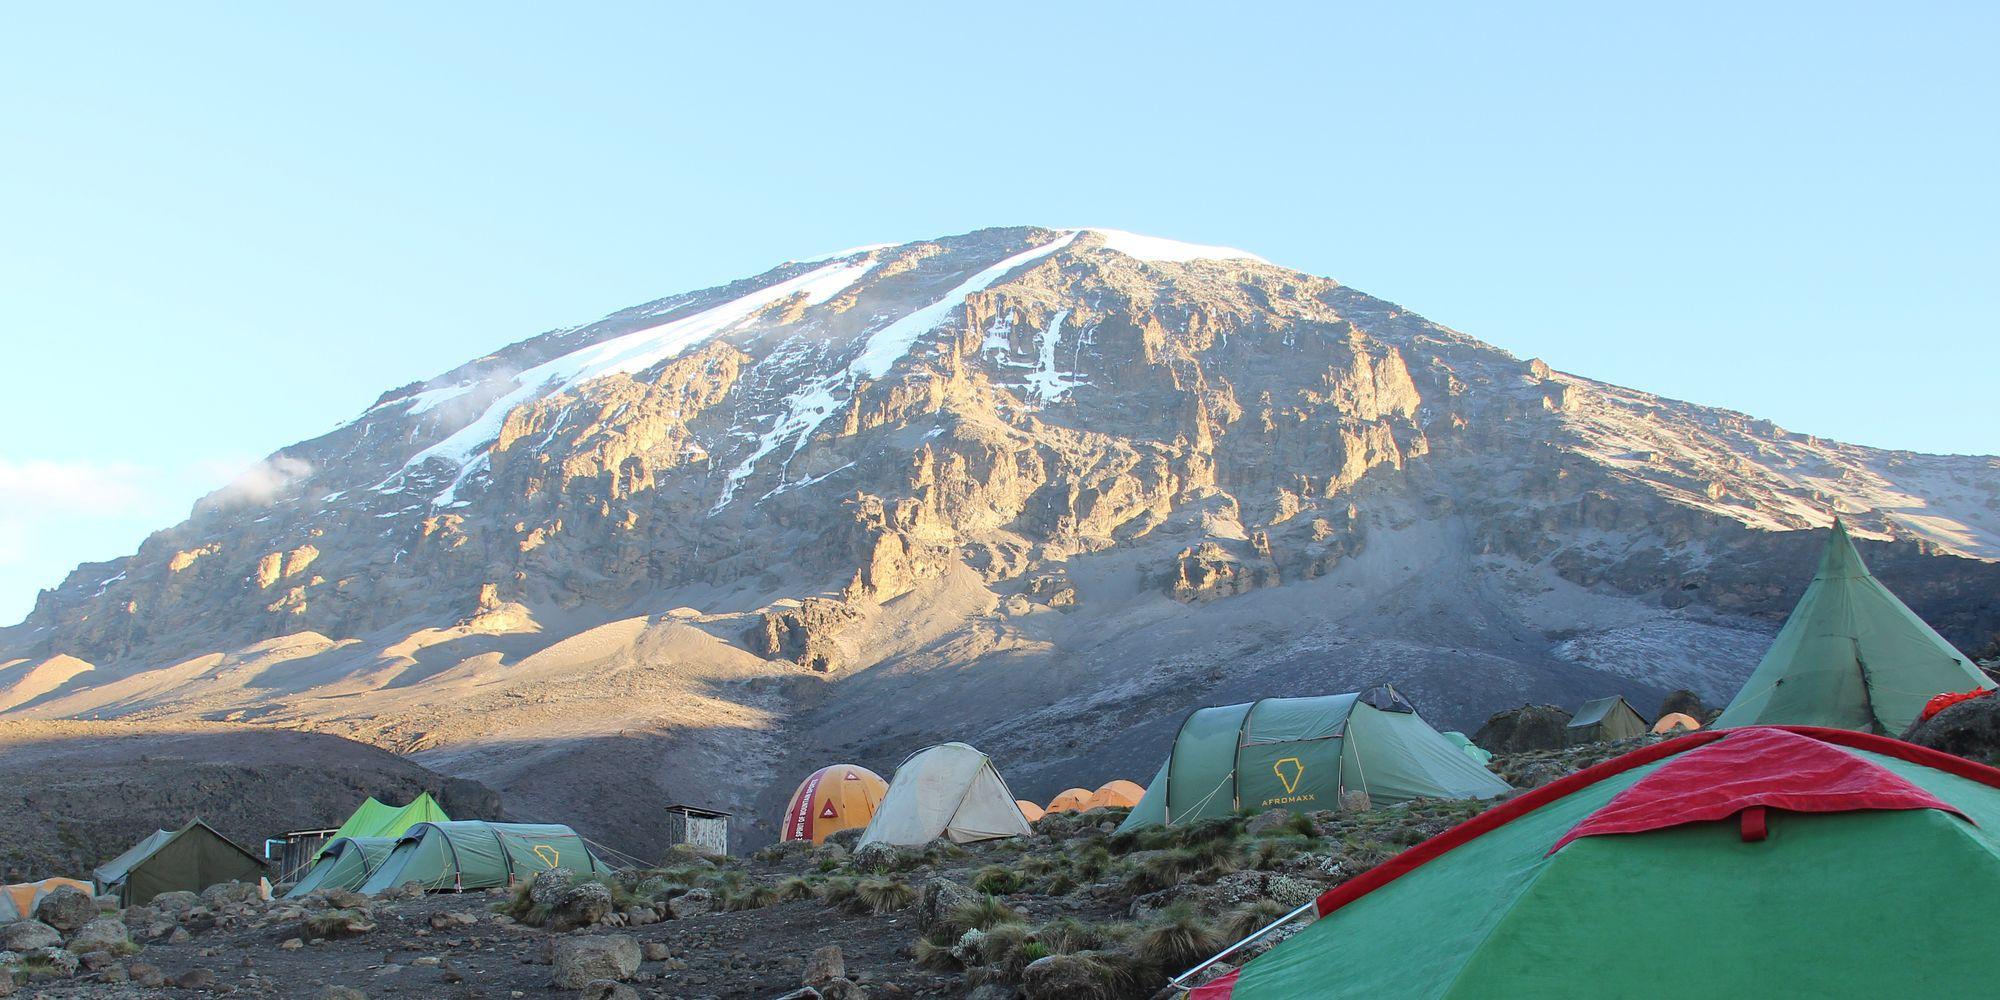 Gipfel des Kilimanjaro 2014 - 7summits4help